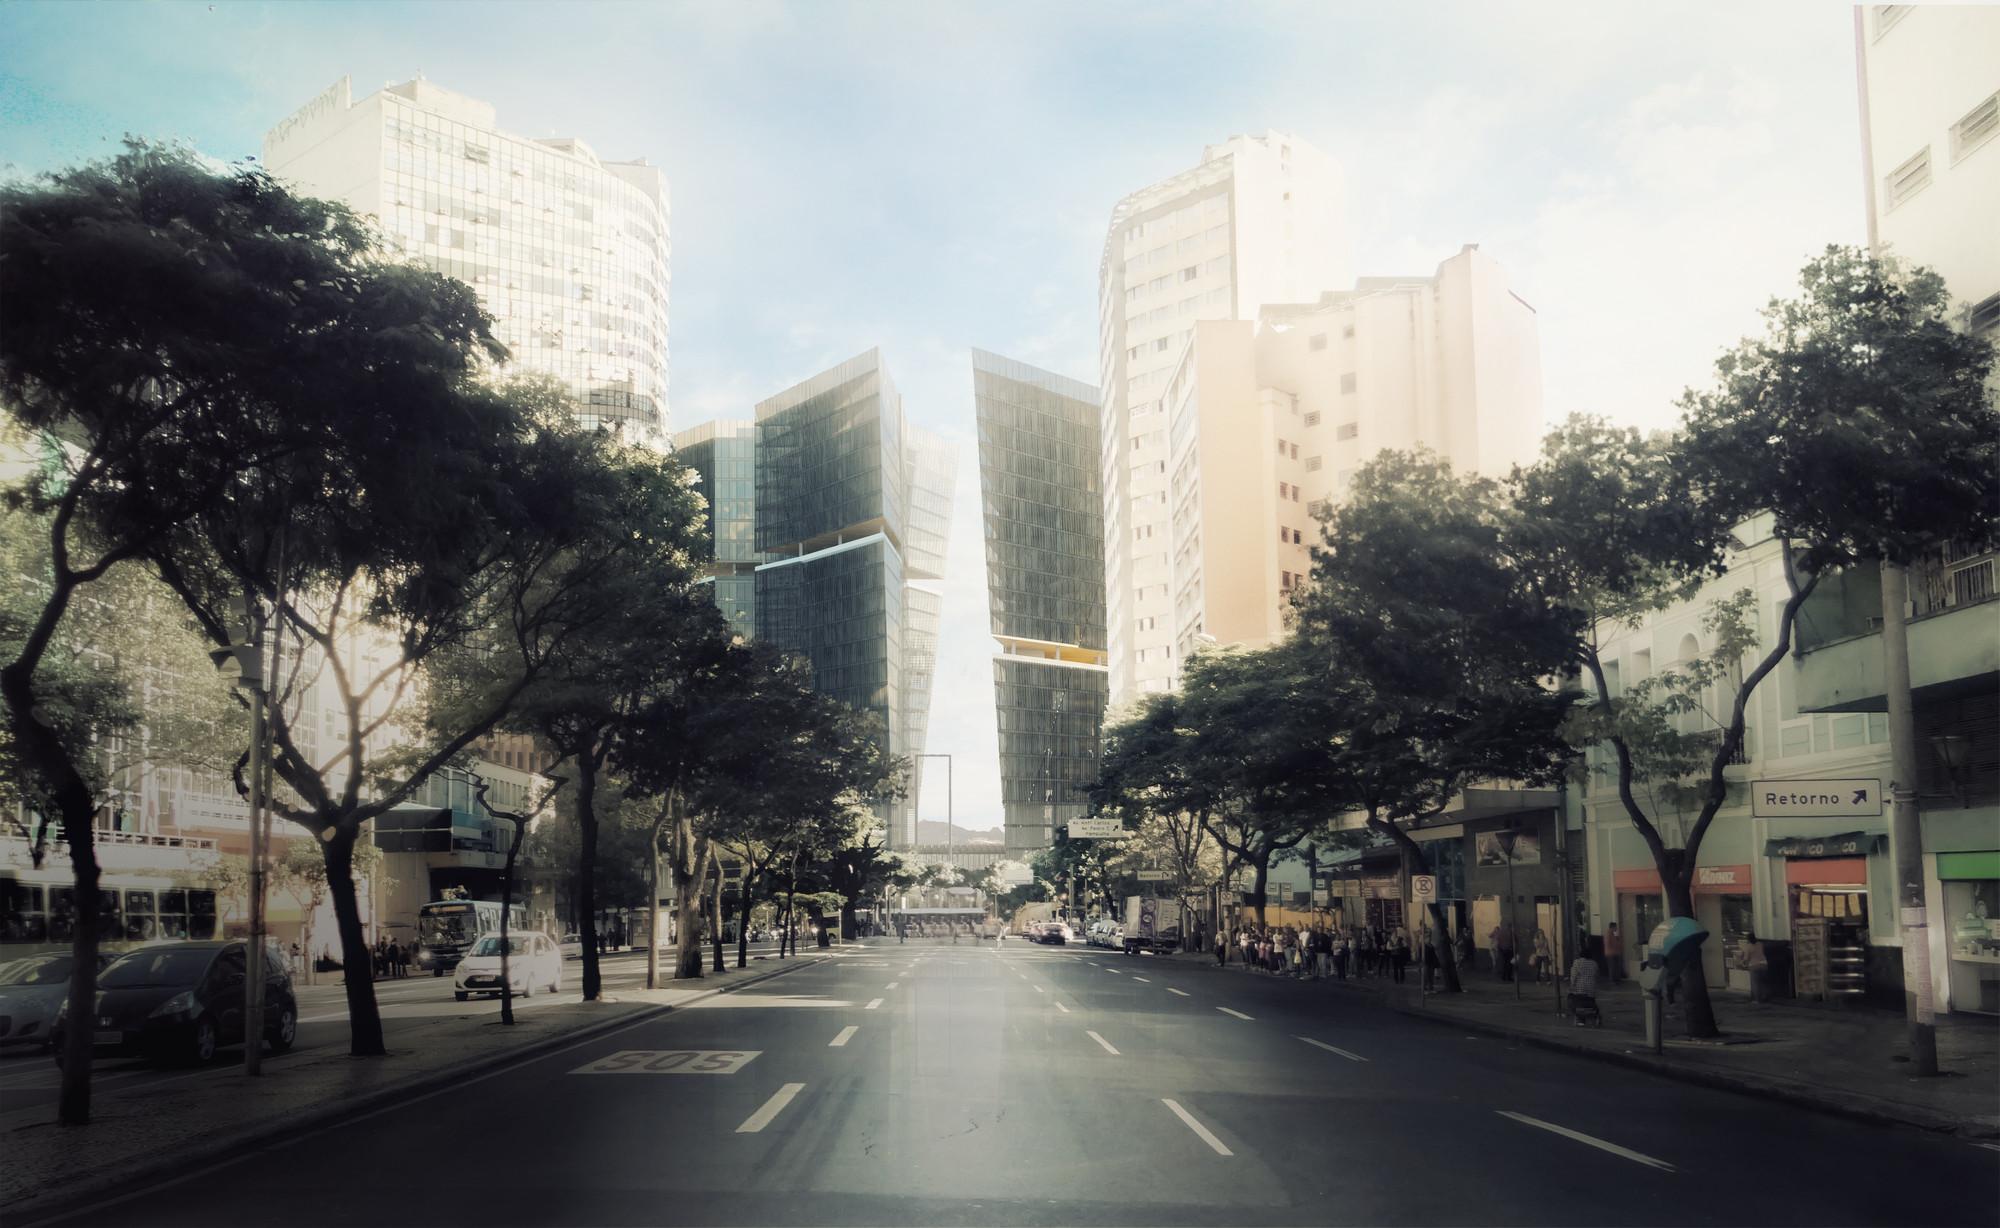 Segundo Lugar no Concurso para o Centro Administrativo de Belo Horizonte / Vazio S/A, Courtesy of Cortesia de Vazio S/A